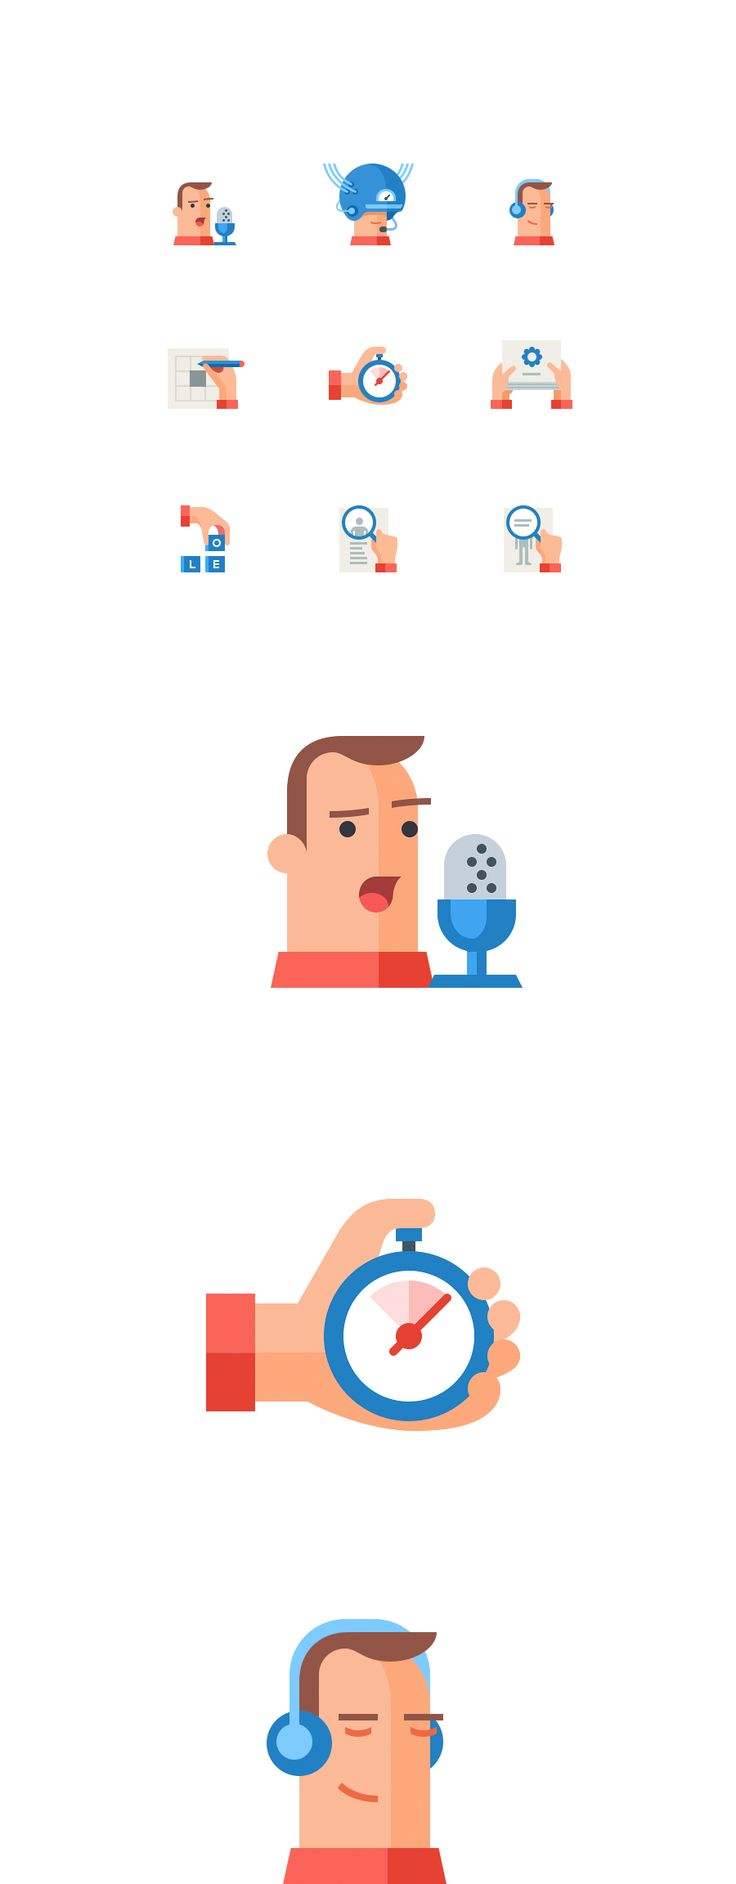 Icon set for LinguaLeo, Icons © Alexey Kuvaldin